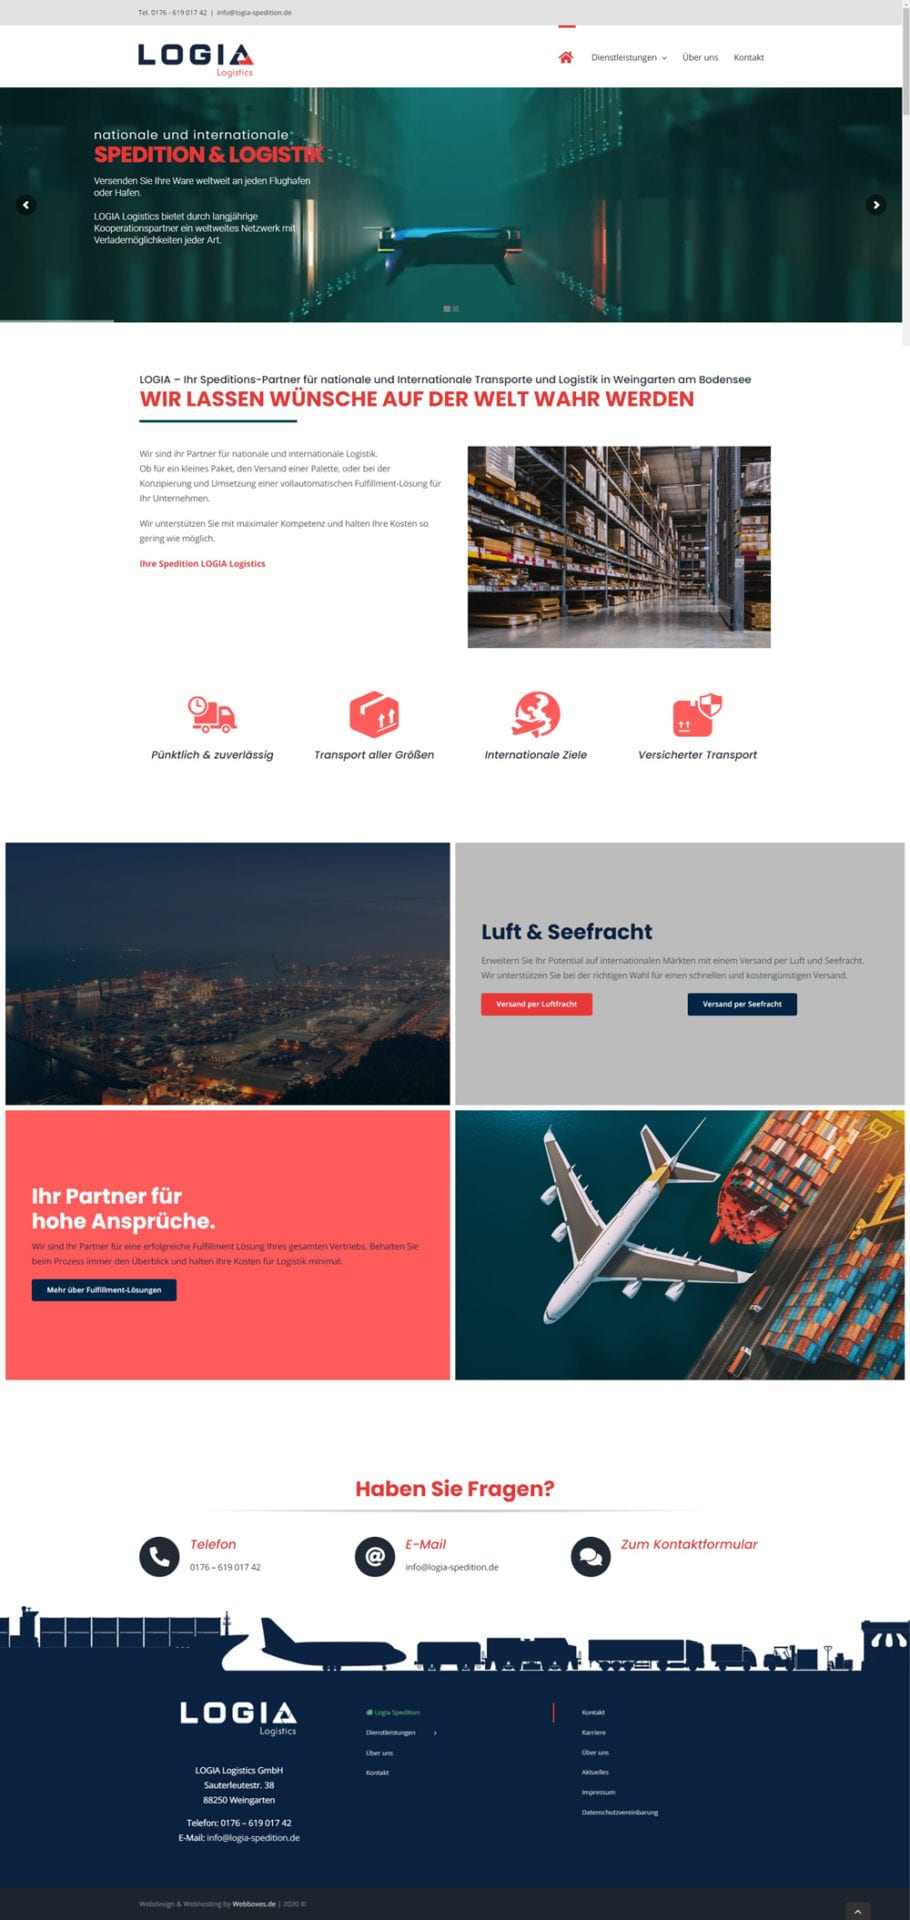 Logia Logistics Website Screenshot